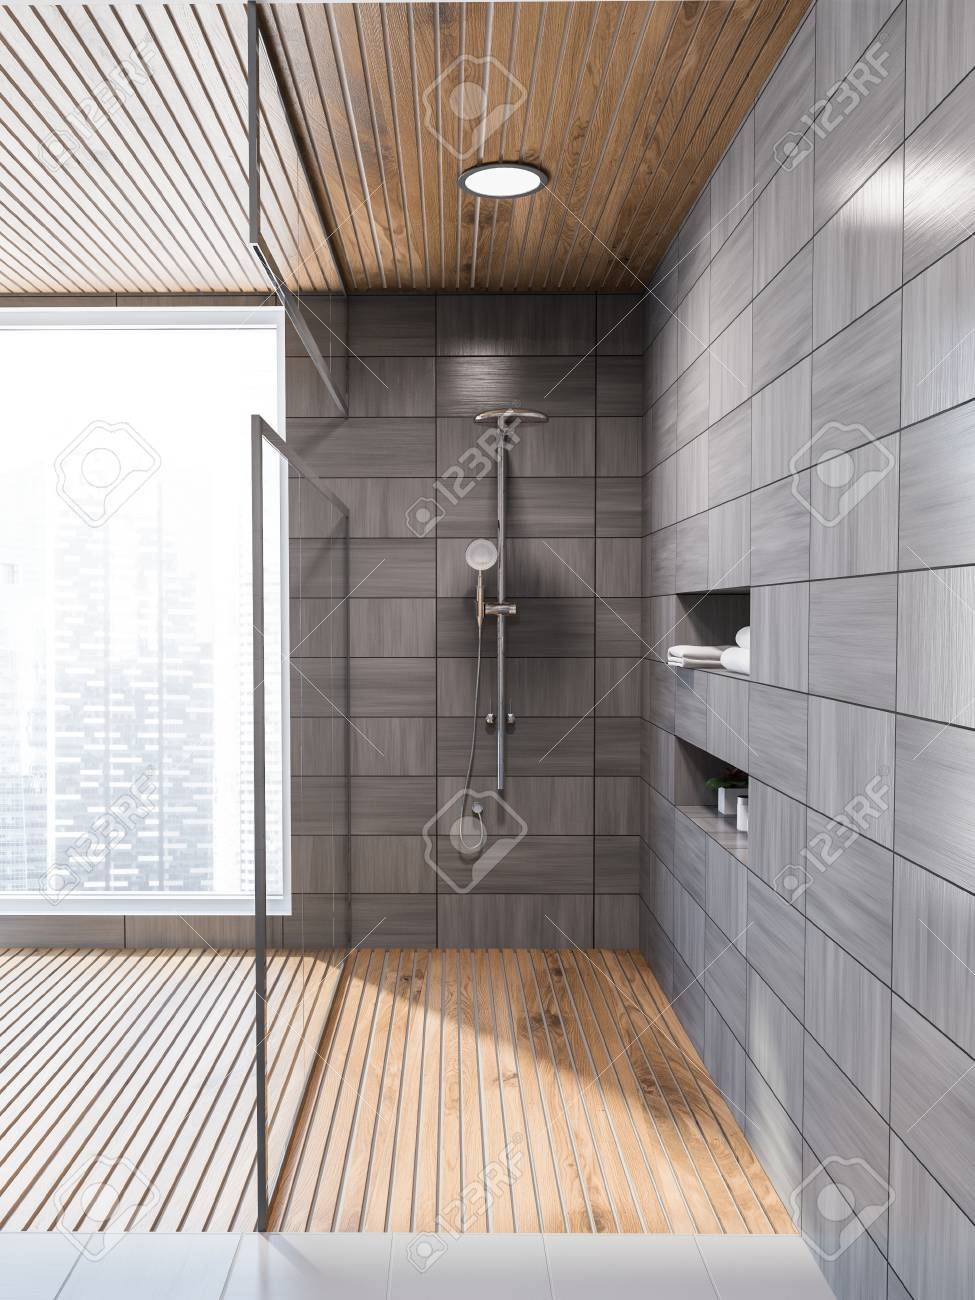 modern gray wooden tiled wall bathroom interior with gray floor